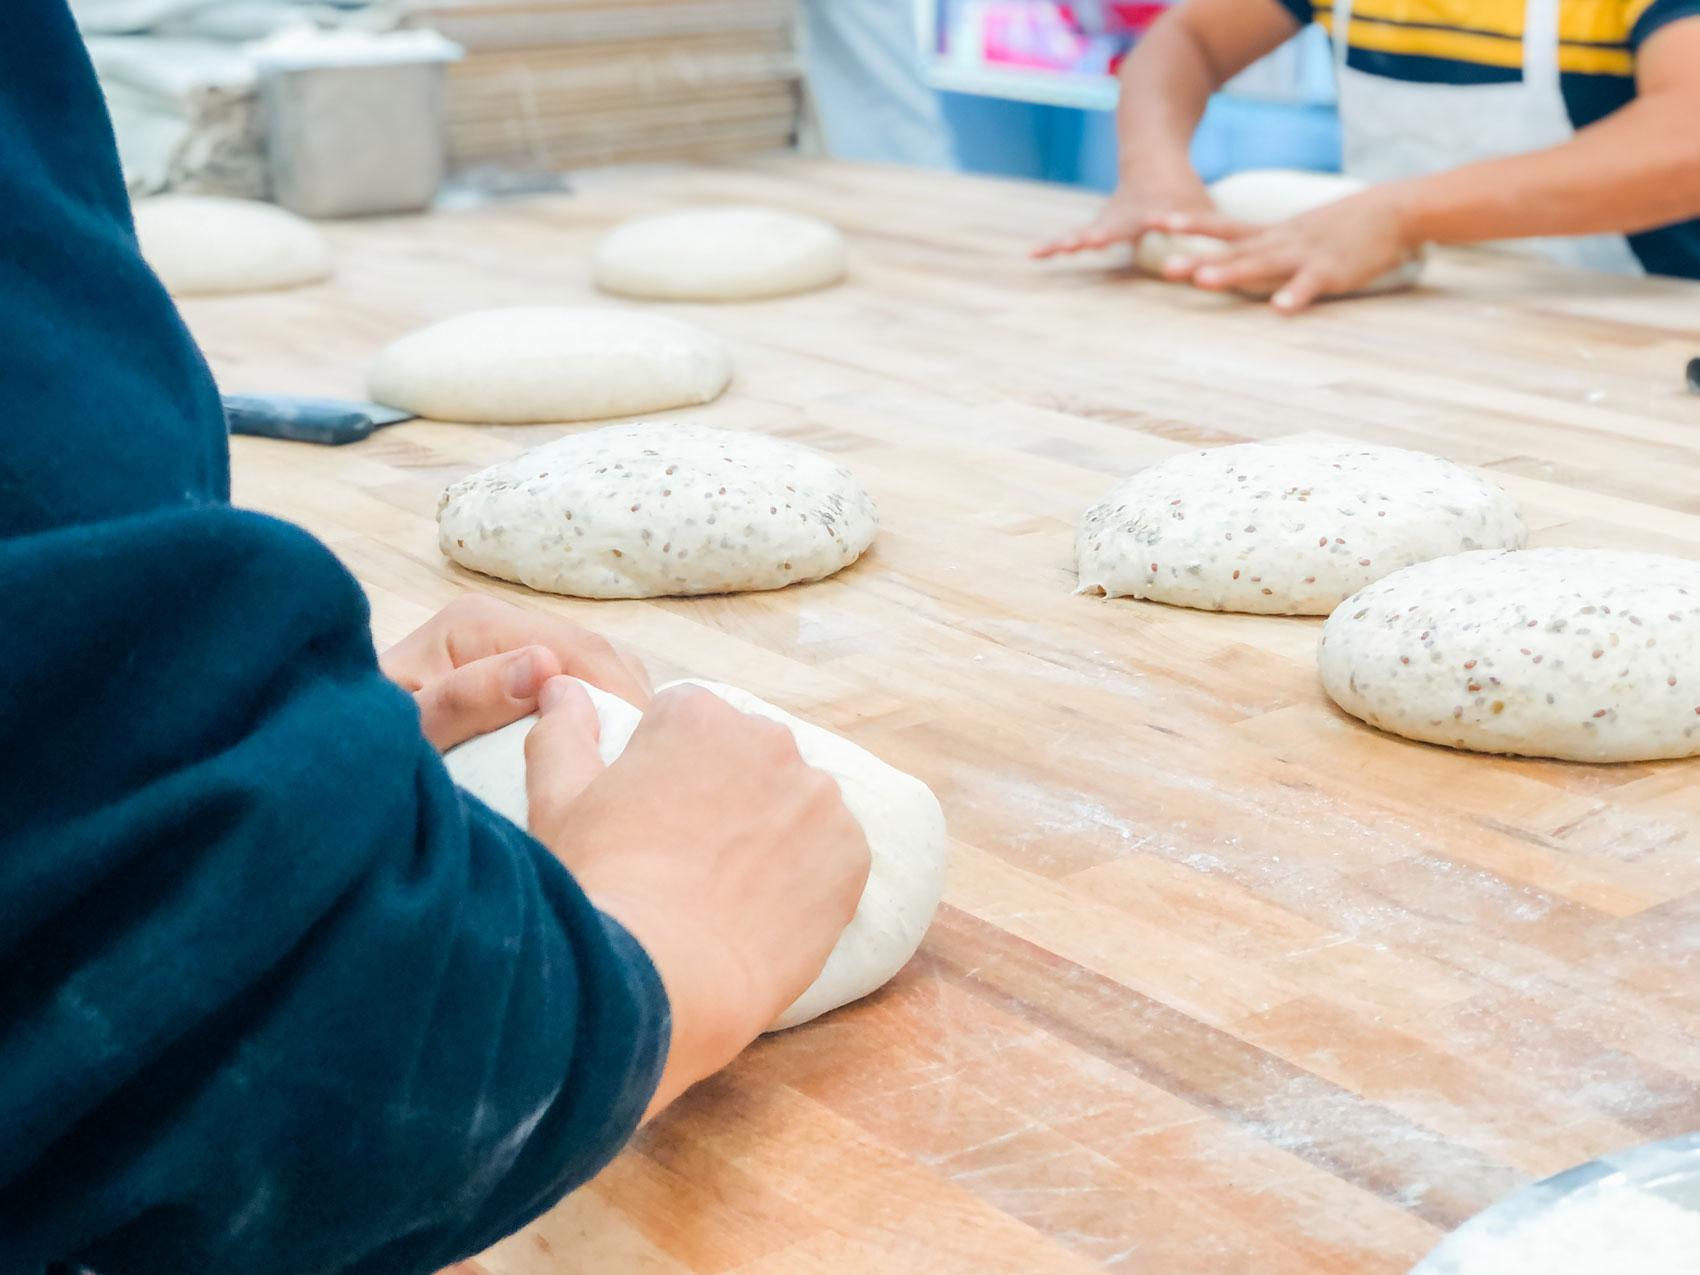 People gently making dough.